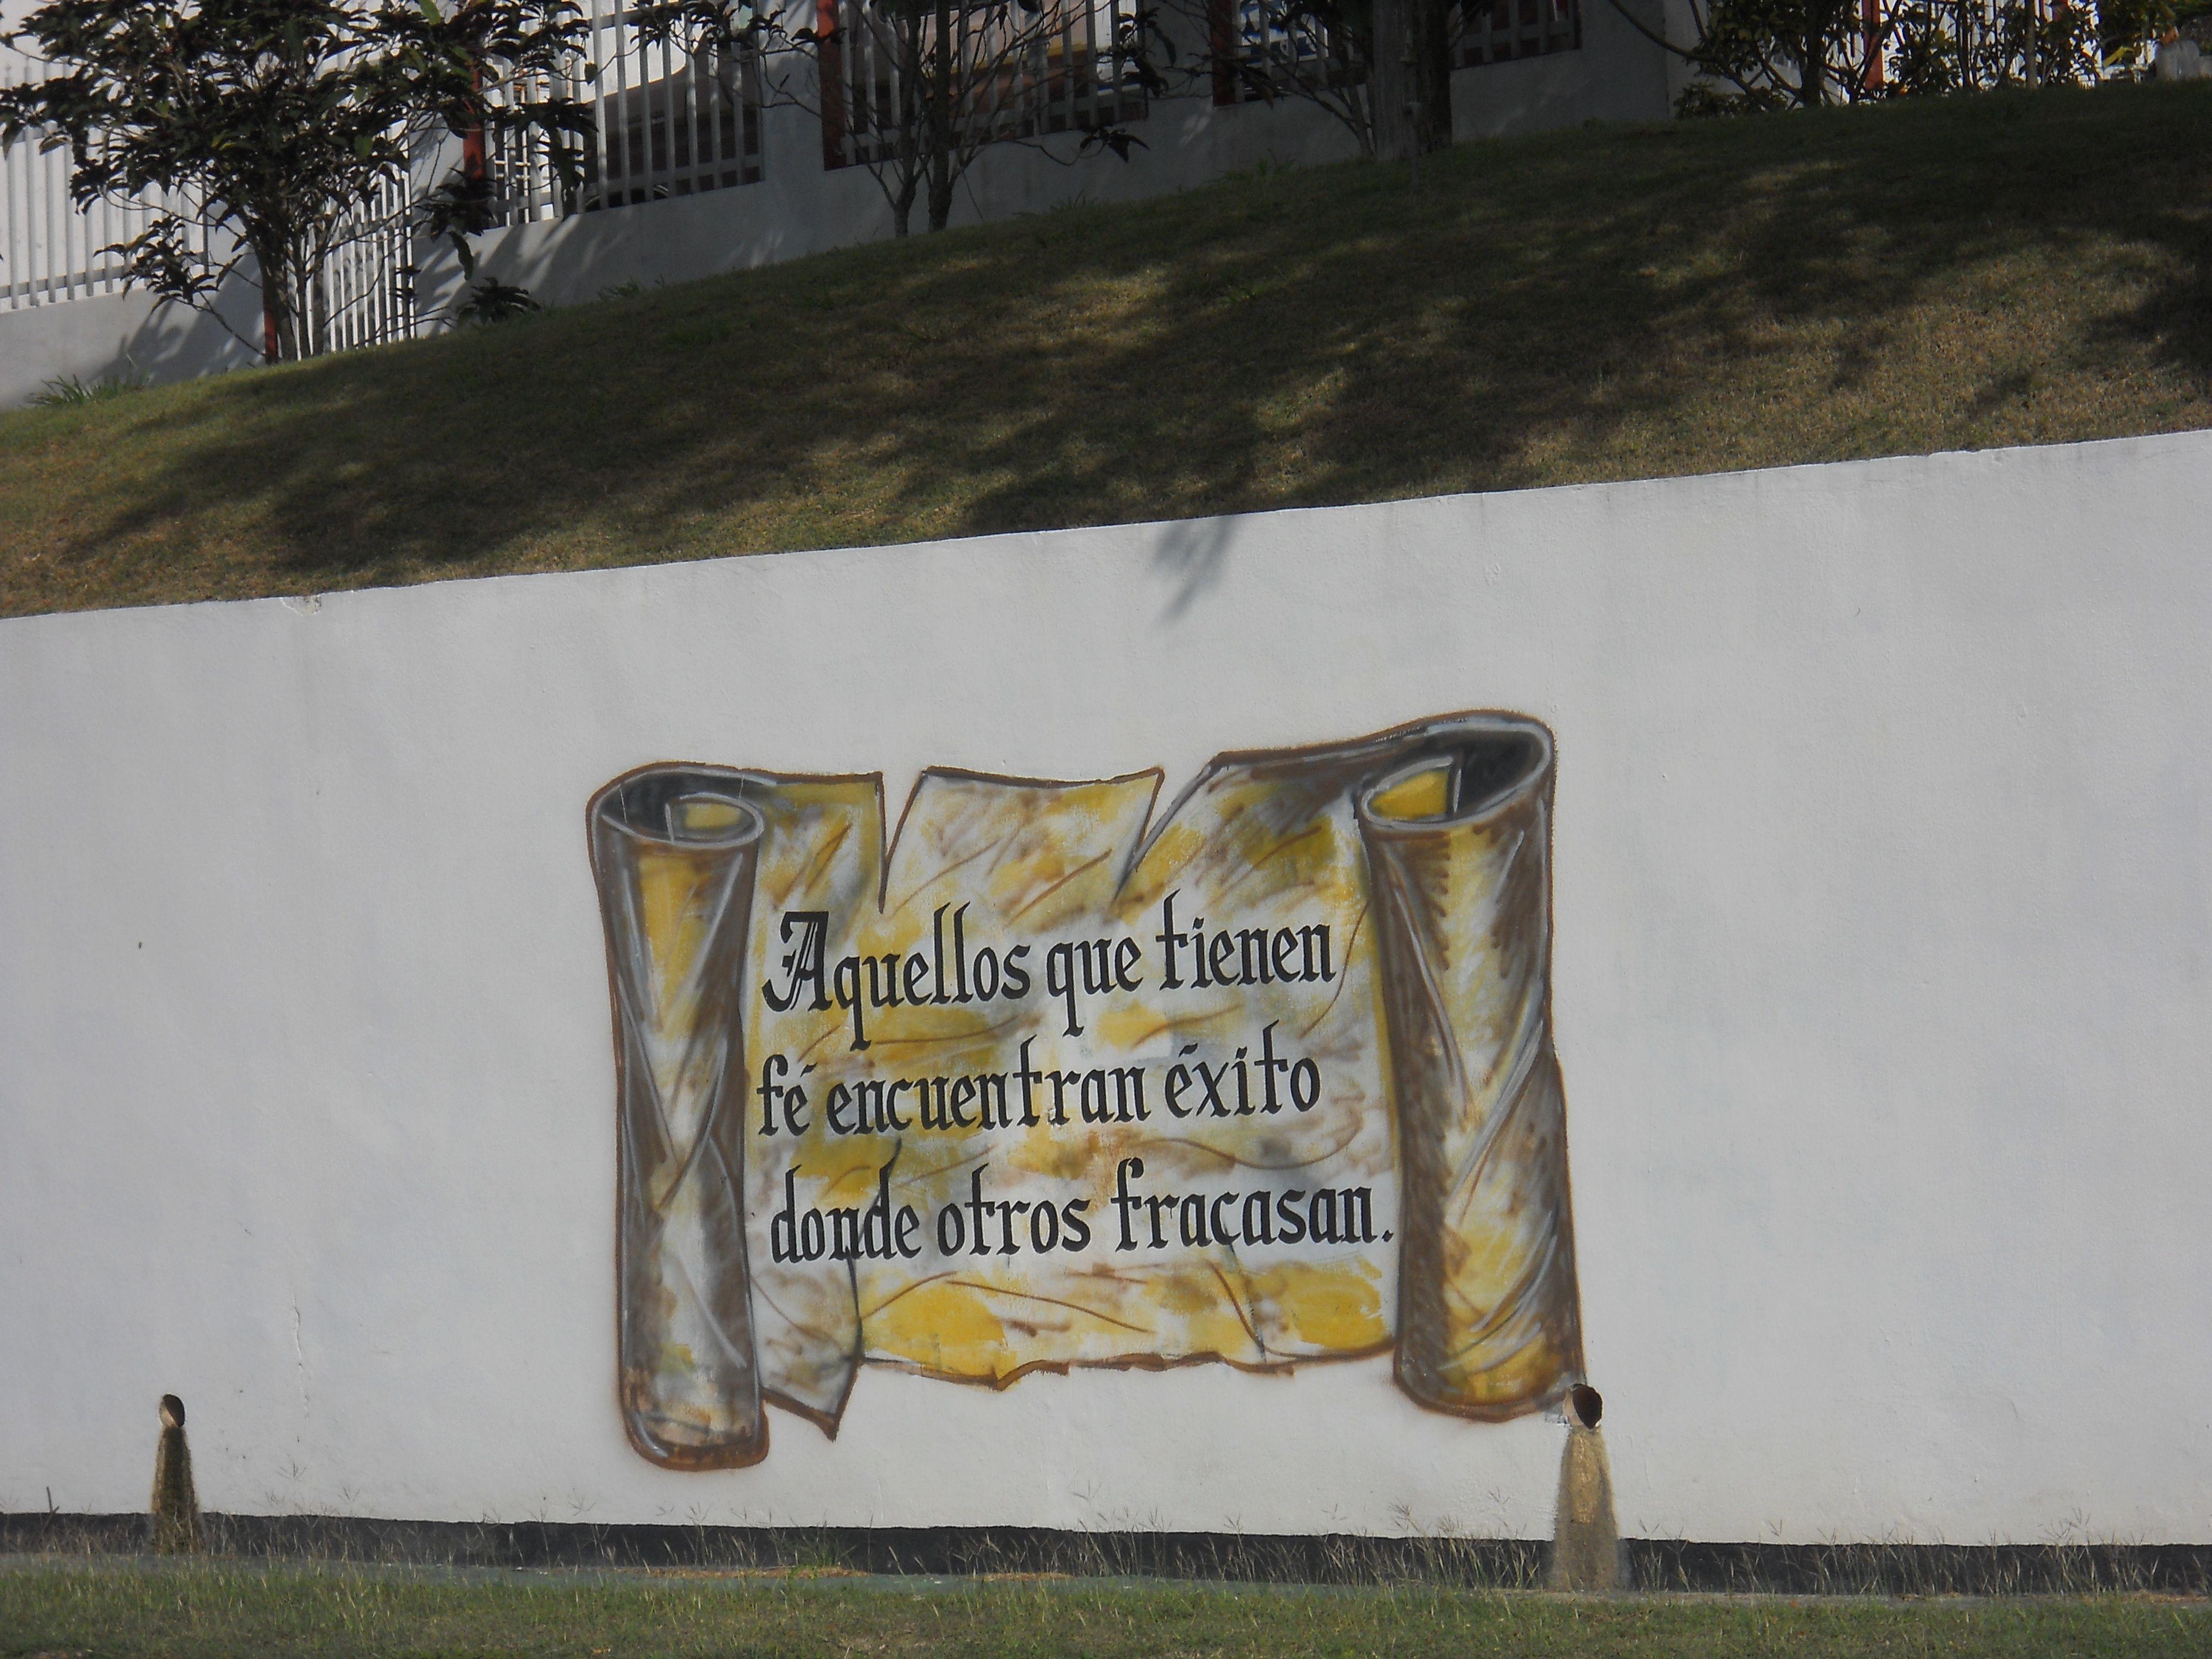 Mural Near Junquito Humacao Humacao Puerto Rico Pinterest # Muebles De Pajilla Puerto Rico